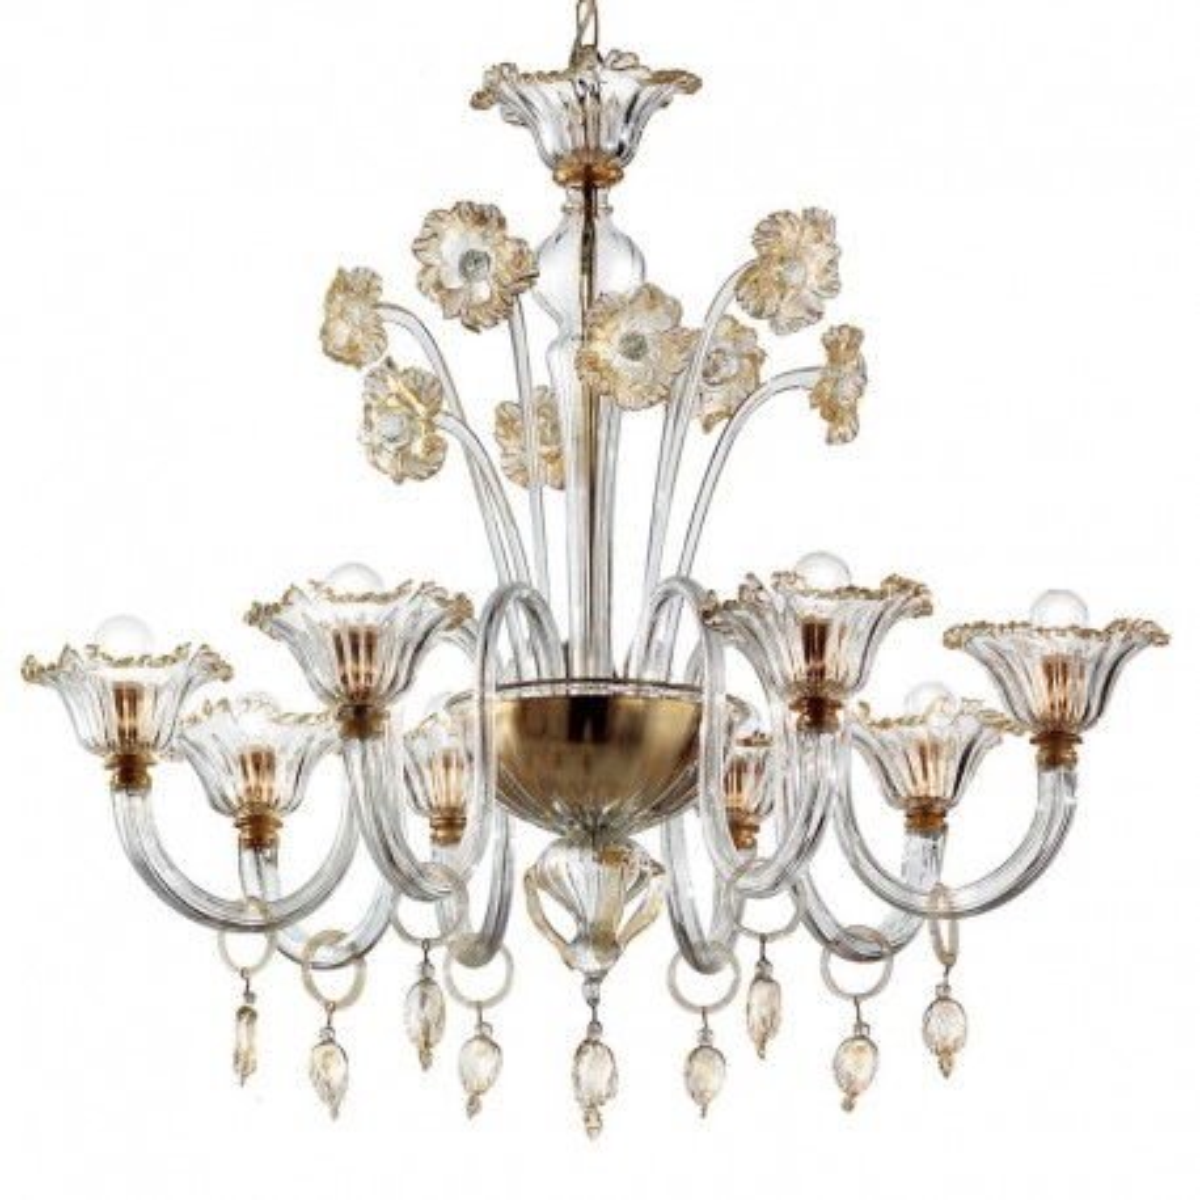 Novecento 8 flammig Murano Kronleuchter - transparent Gold Farbe